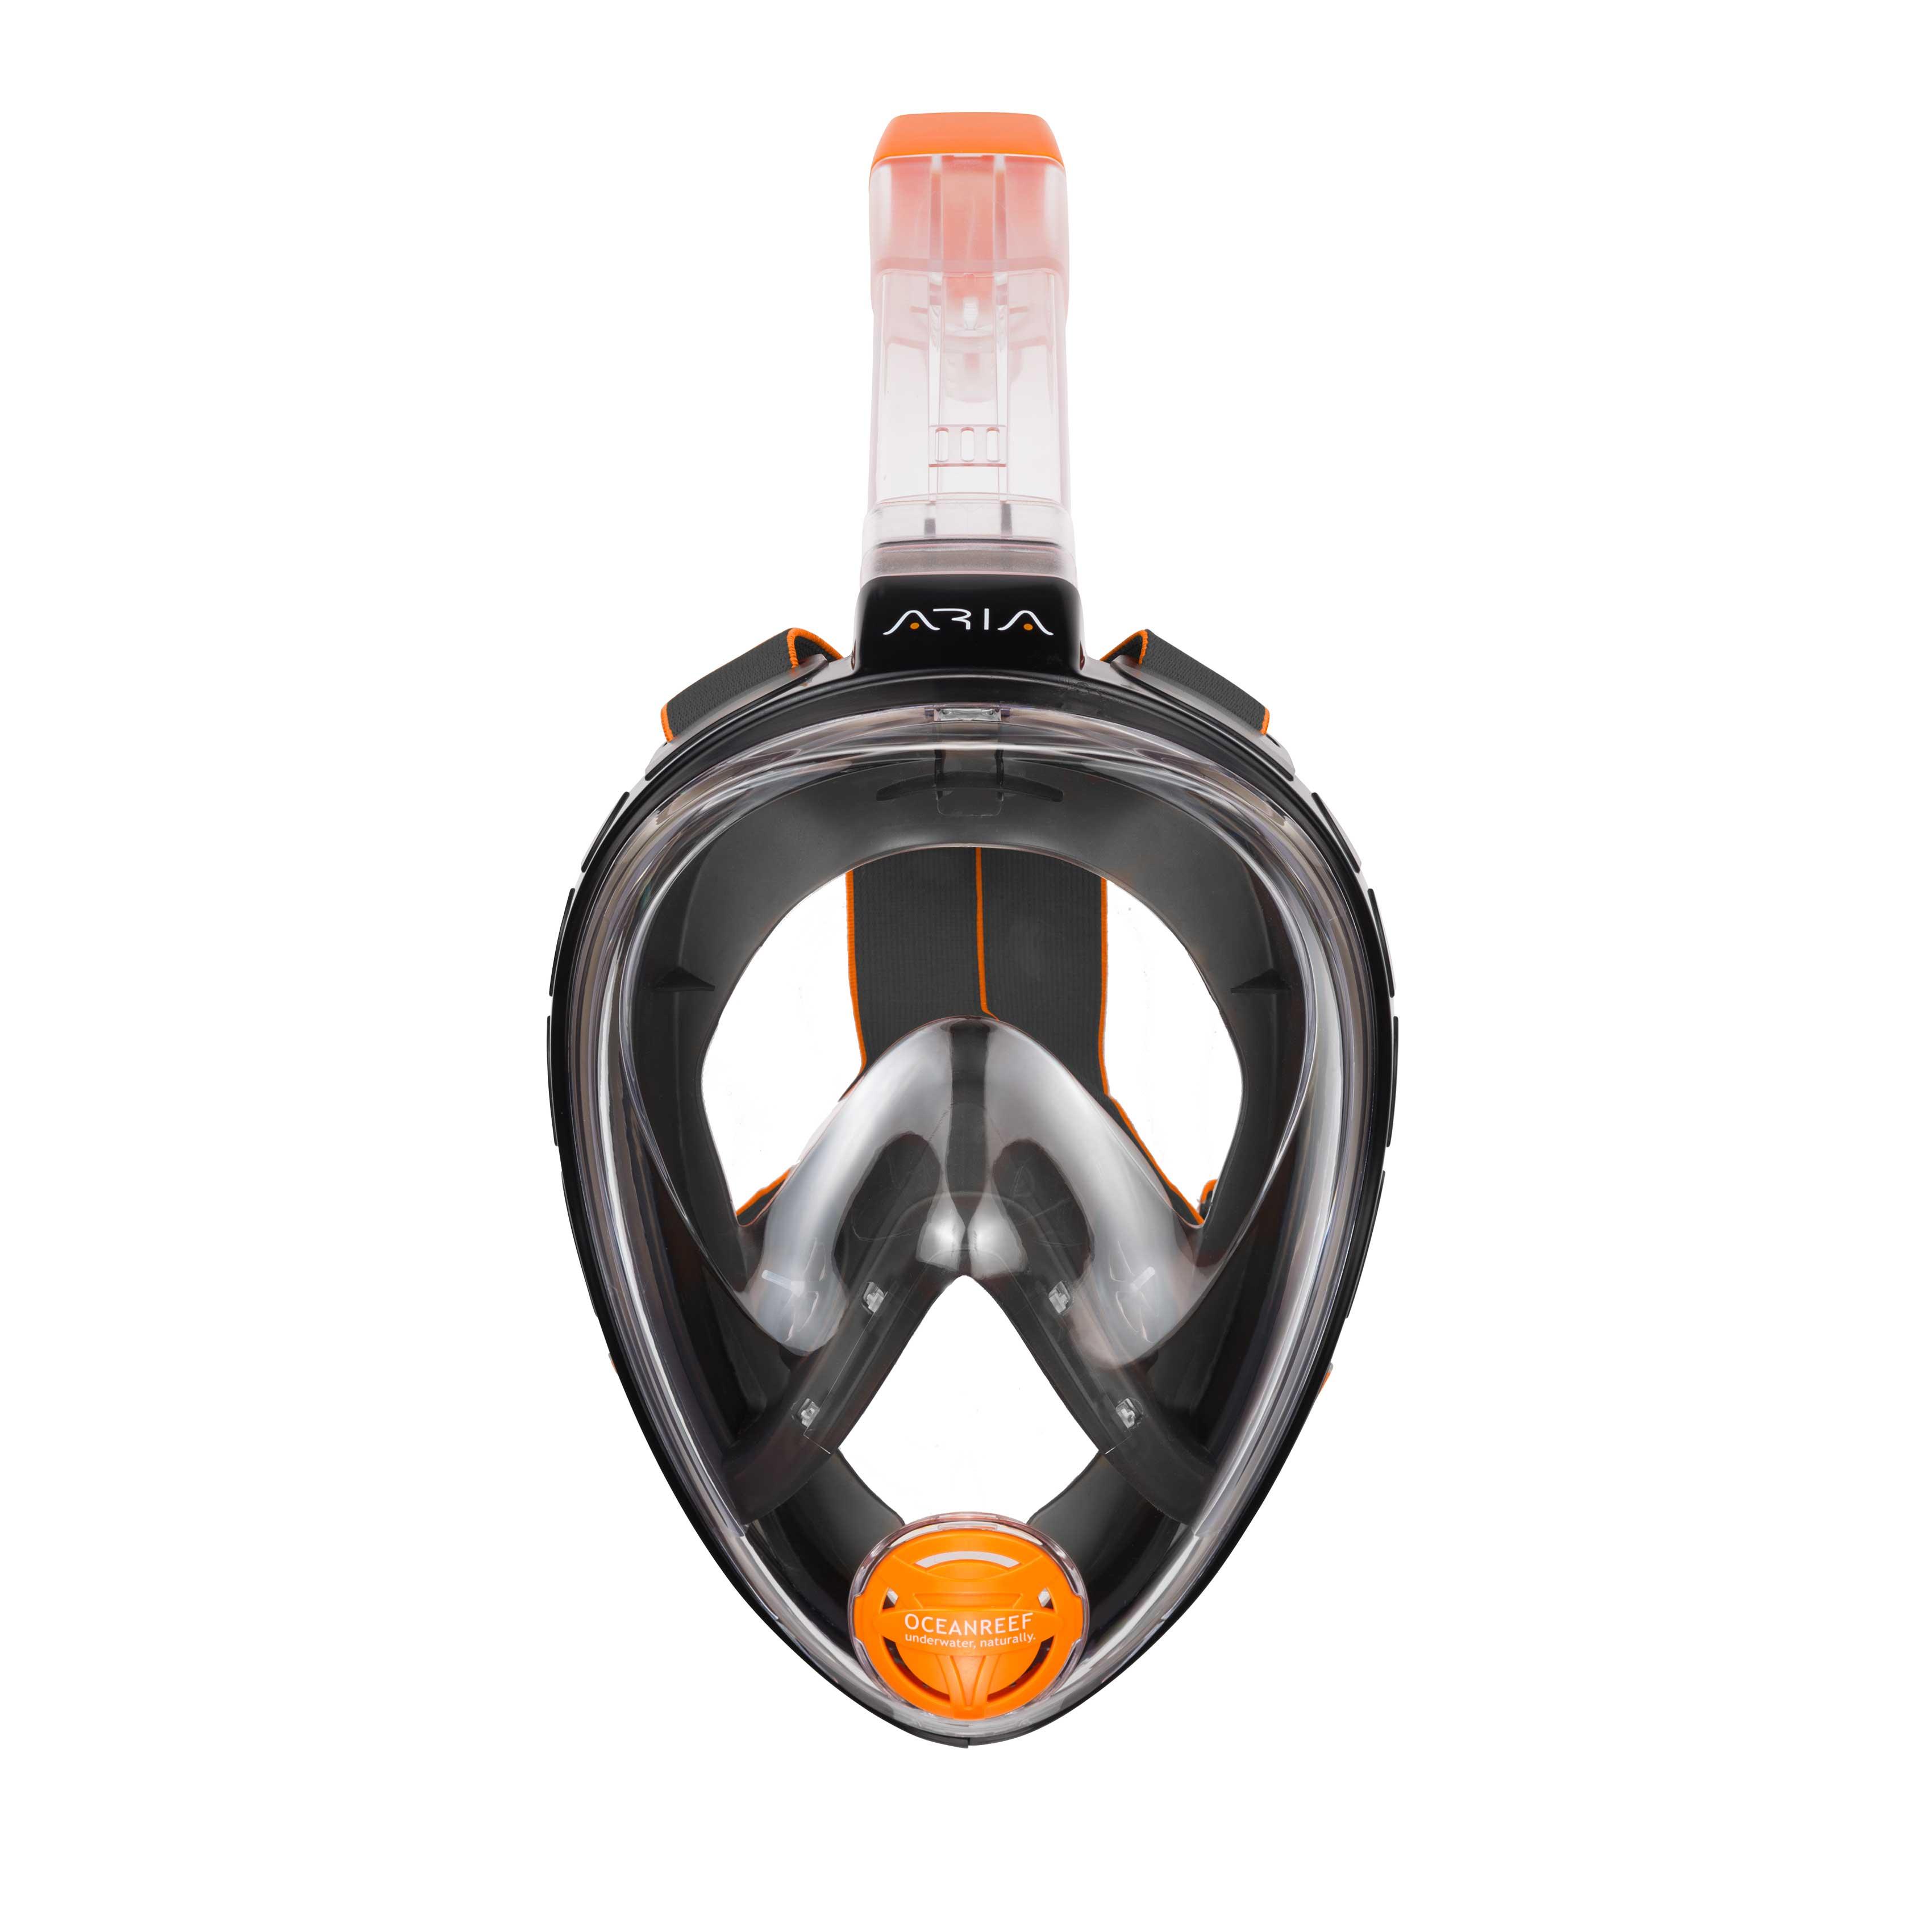 Aria Classic Black Ocean Reef Snorkeling